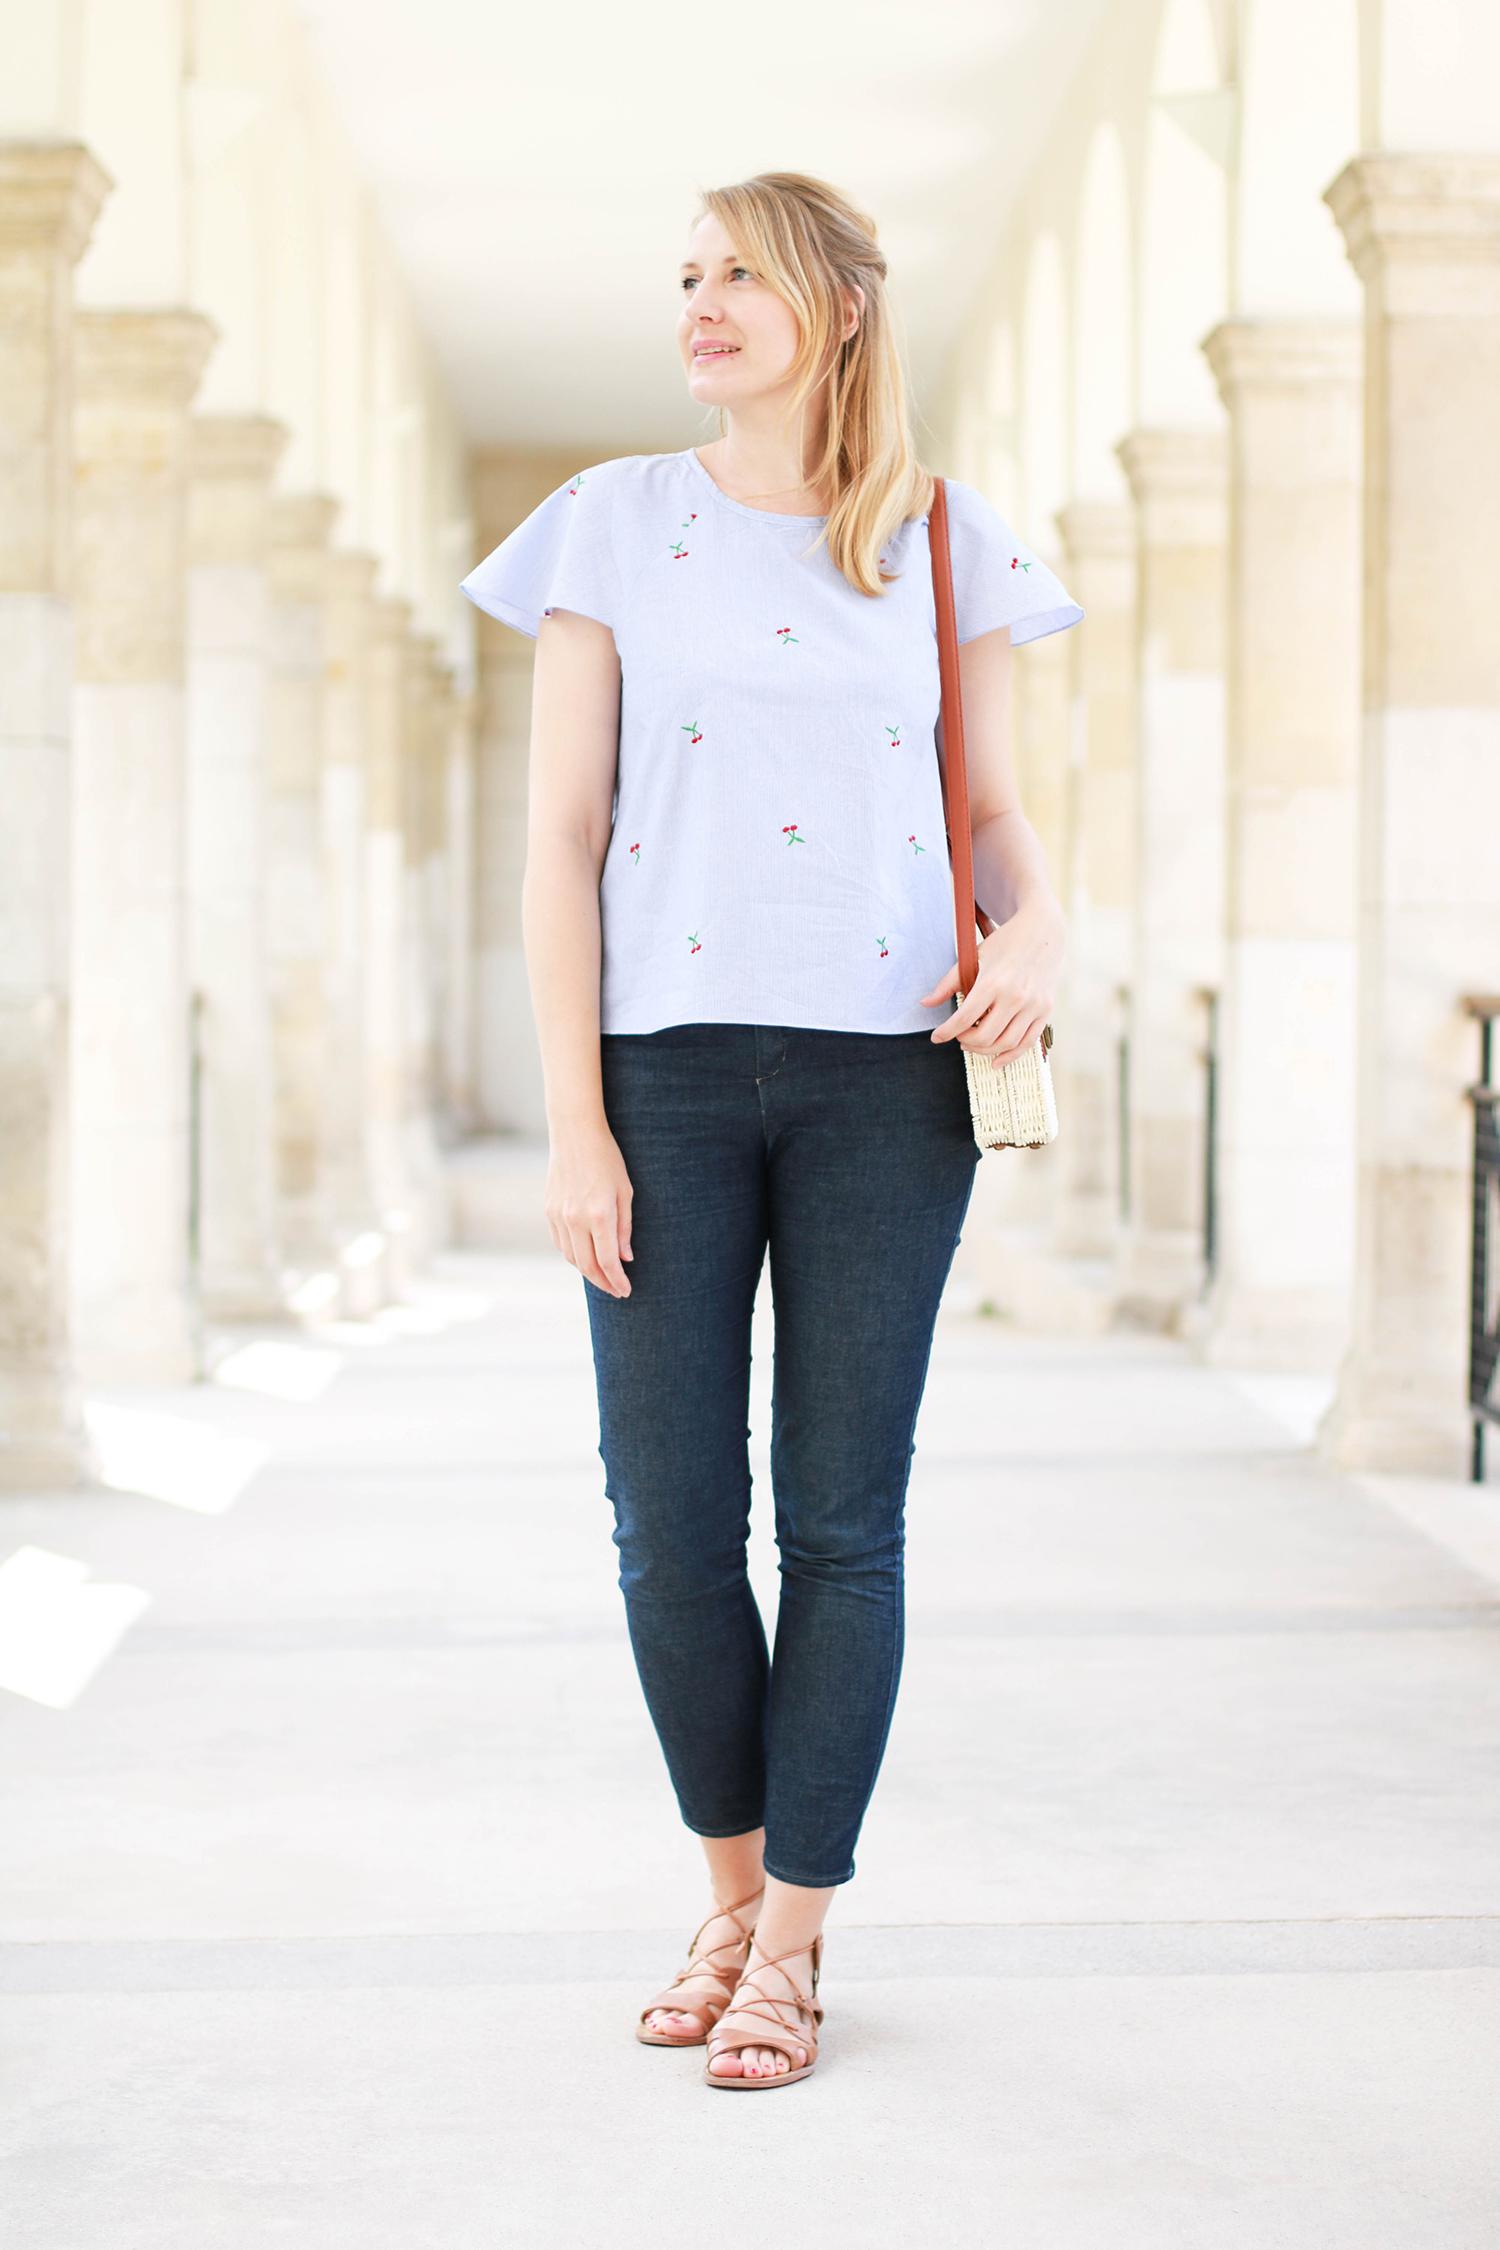 blog-couture-top-imaia-cerises